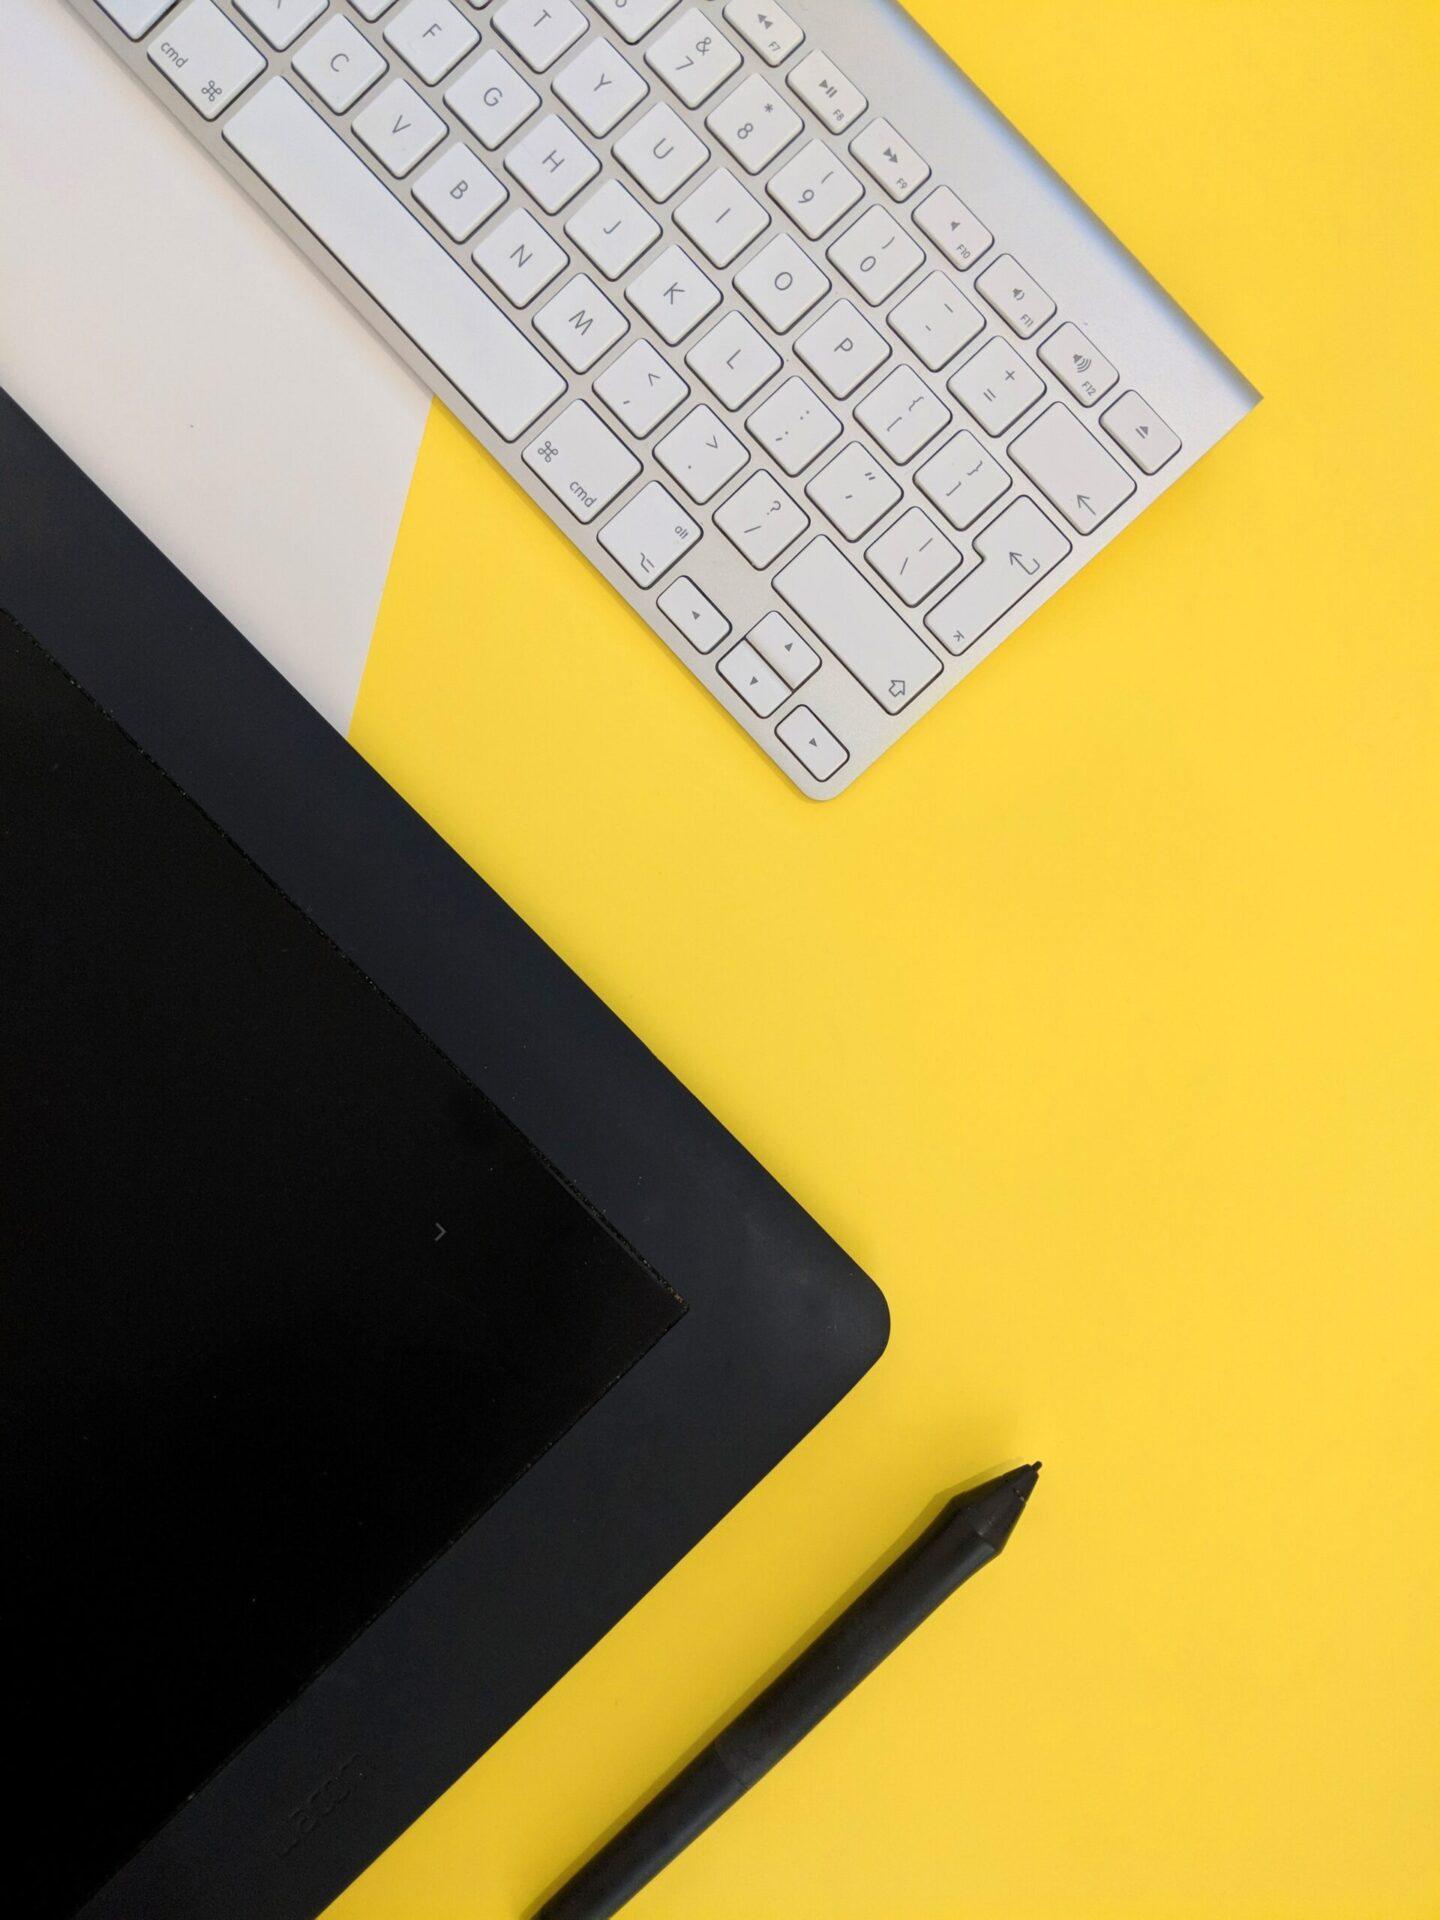 Digital Marketing Agency Hampshire